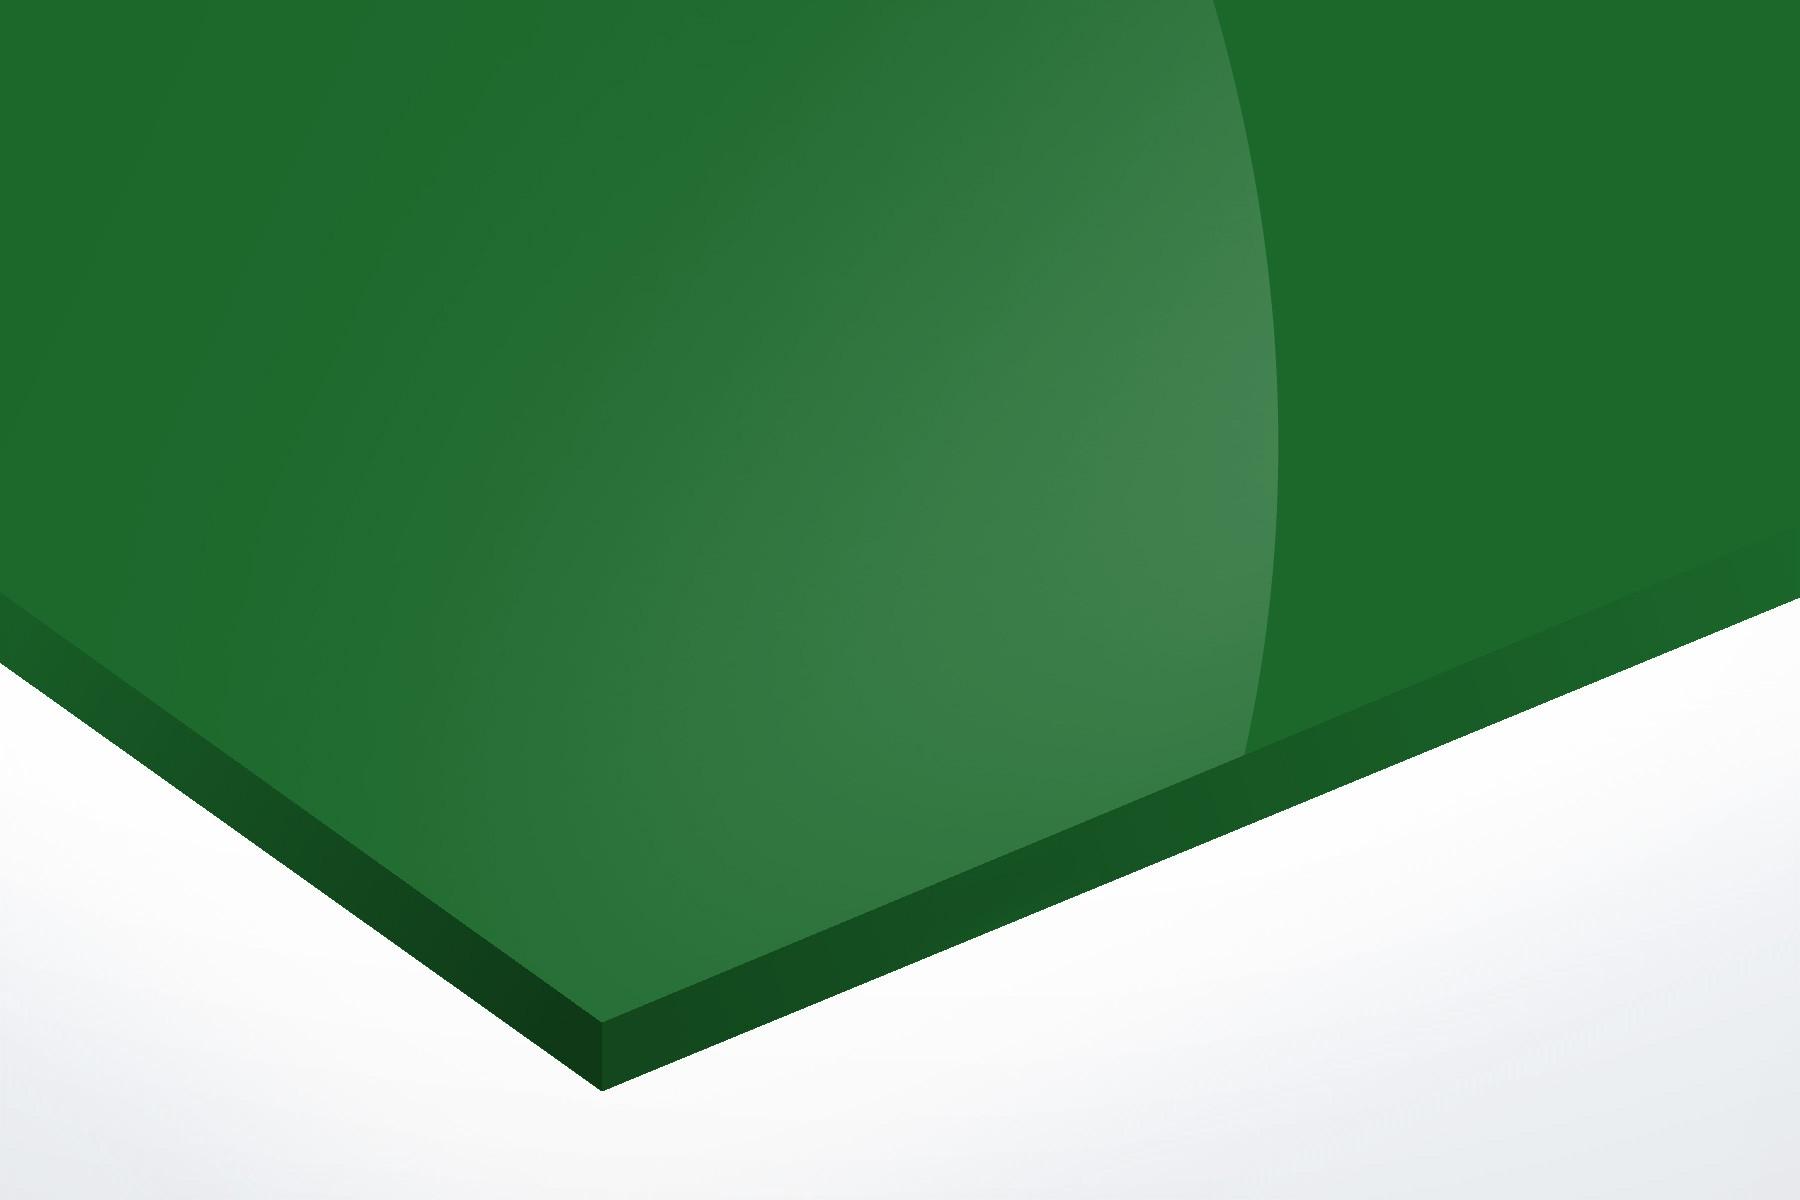 302/10/7097 Alu brillant Vert 1mm